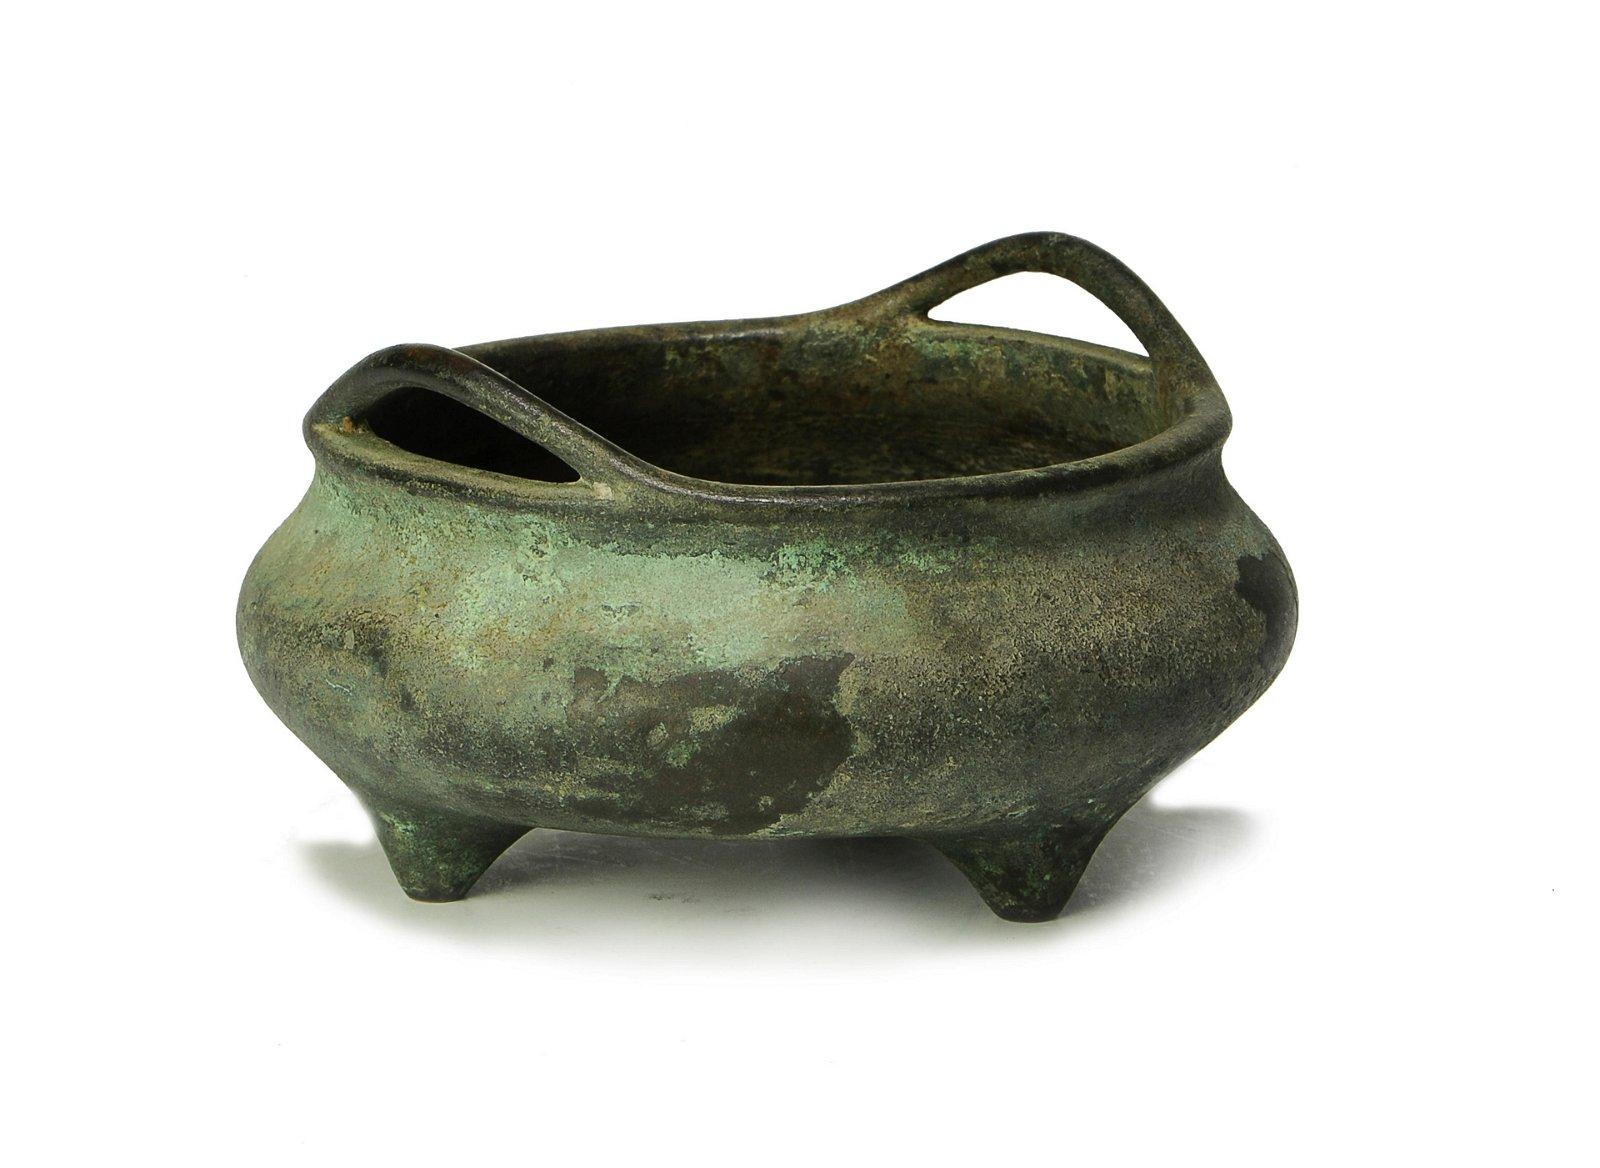 Chinese Bronze Incense Burner, 18th Century, Marked